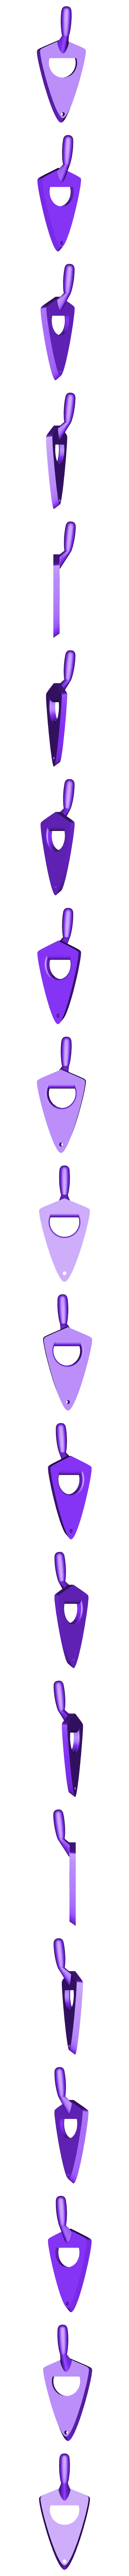 TrowelOpener-NoText.stl Download free STL file Trowel Bottle Opener • 3D printer object, DuaneIndeed